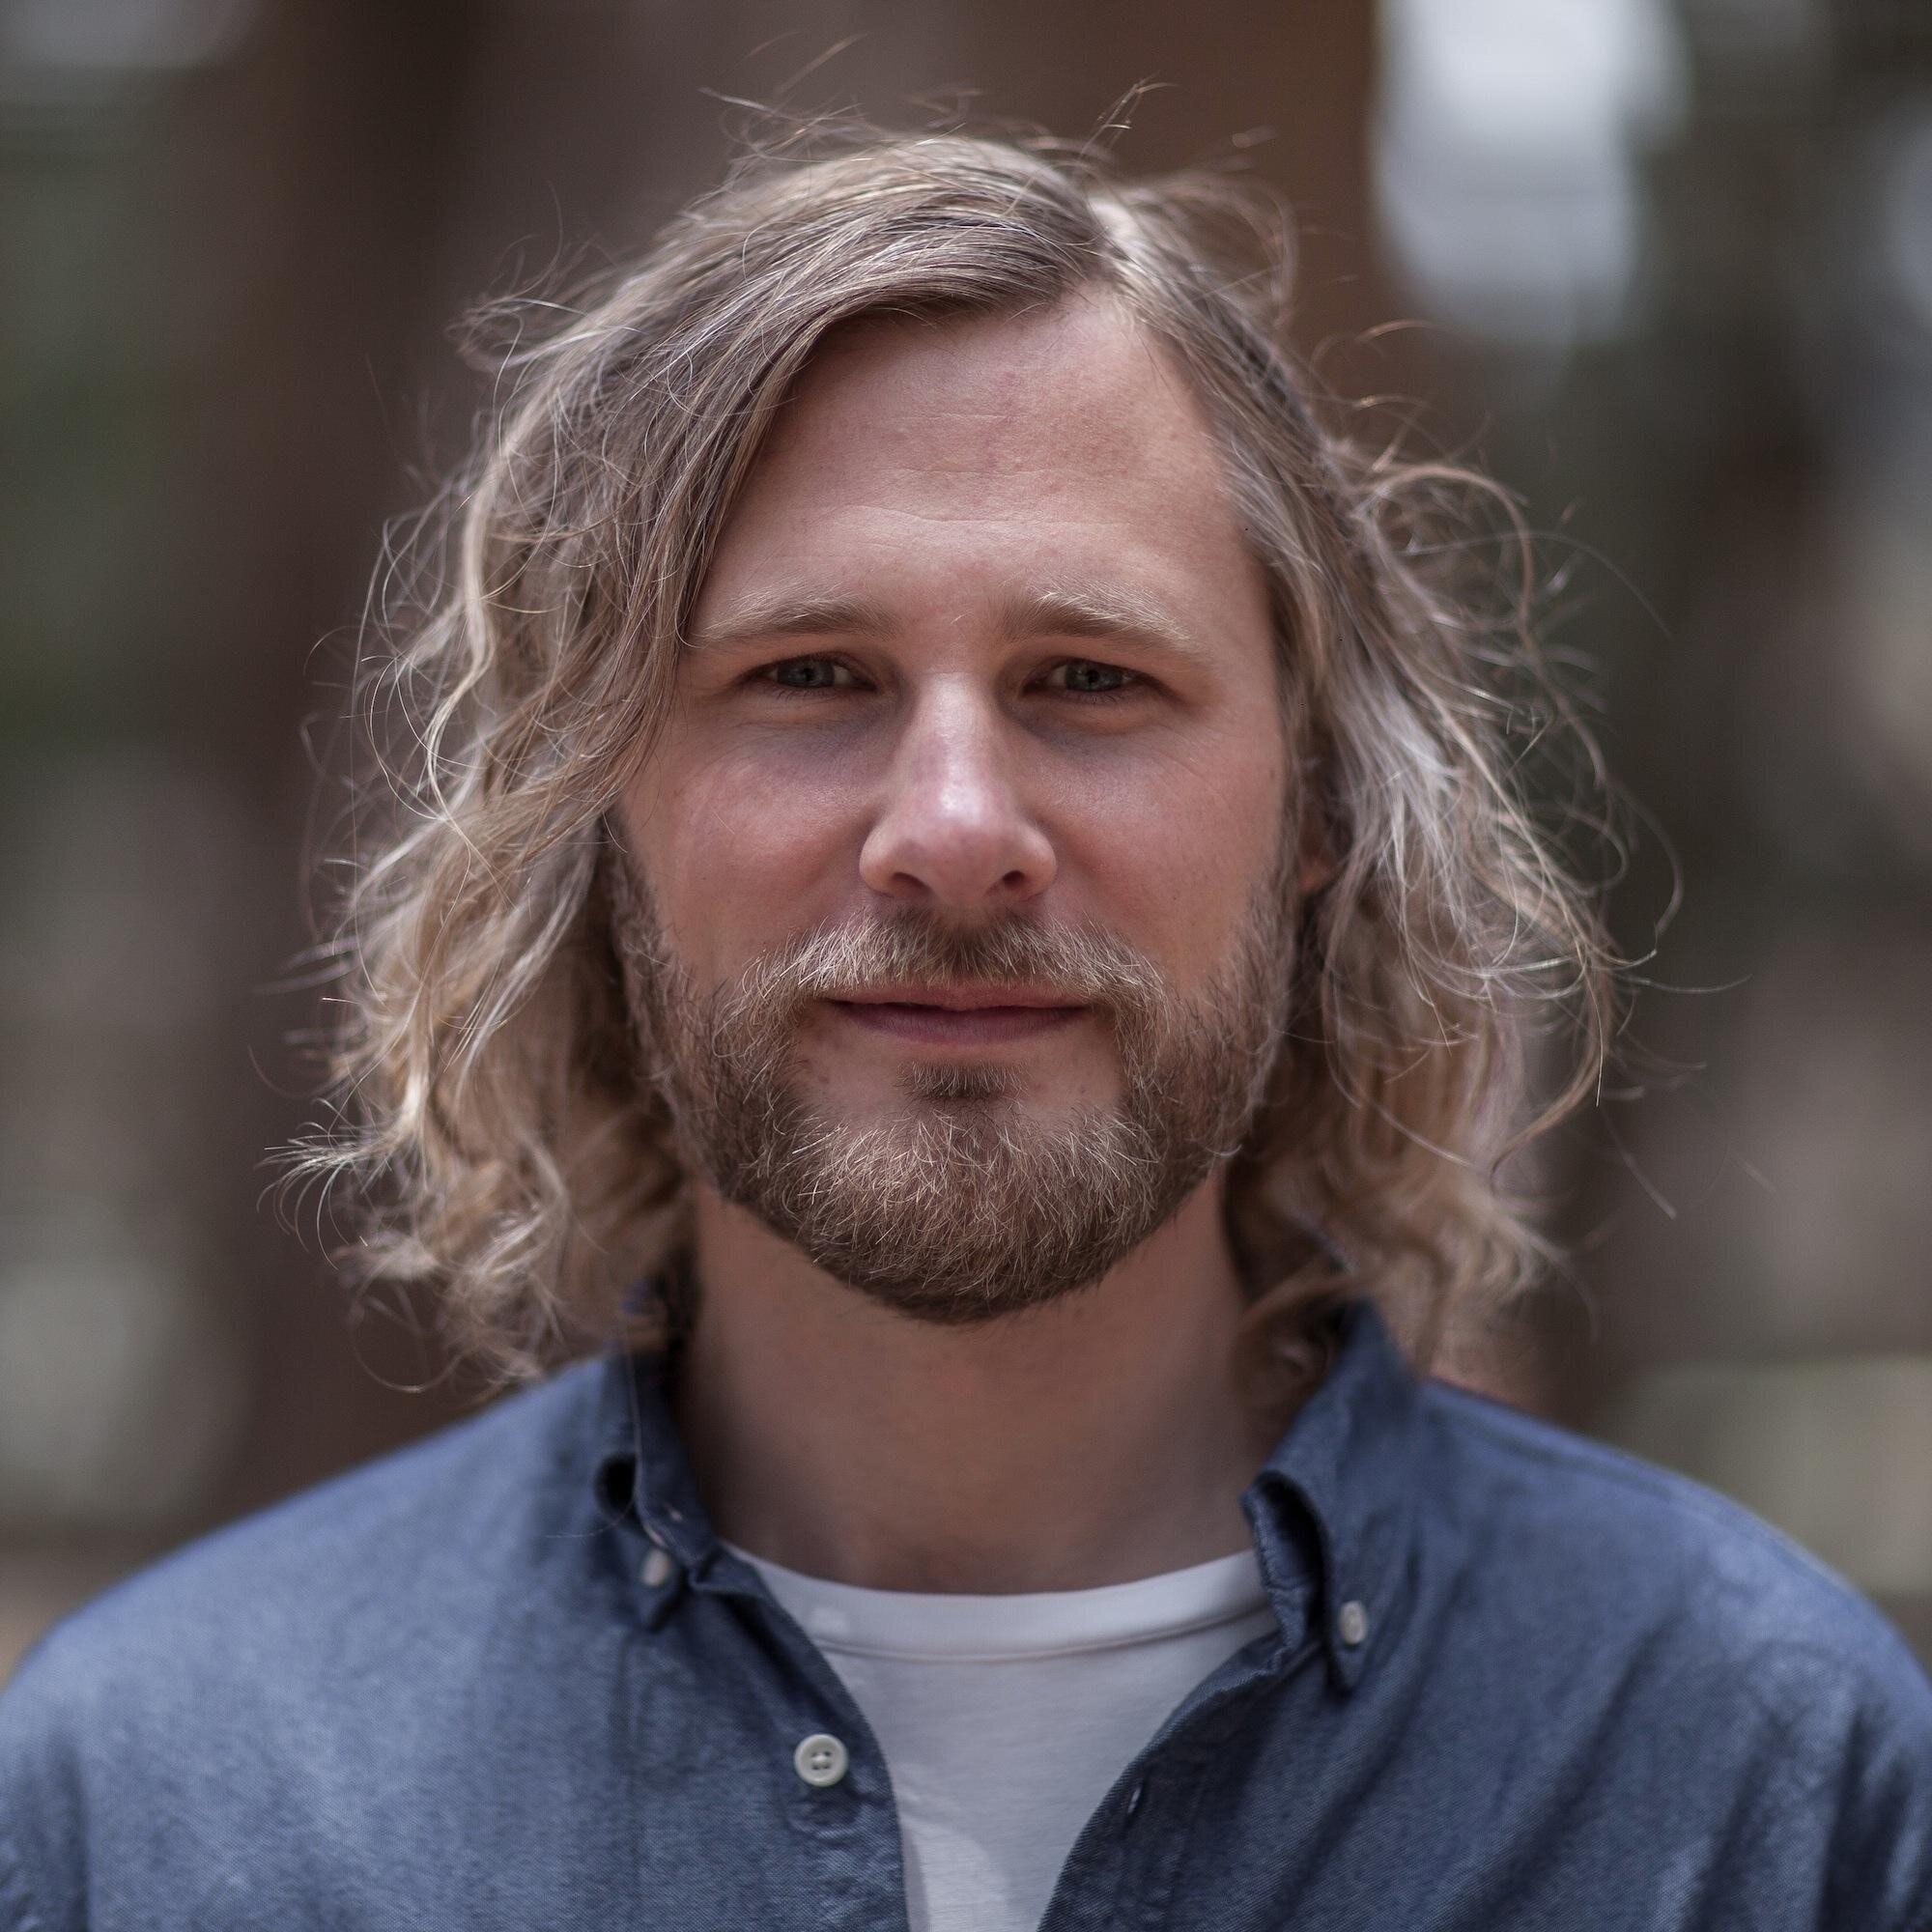 Matthew Whittaker